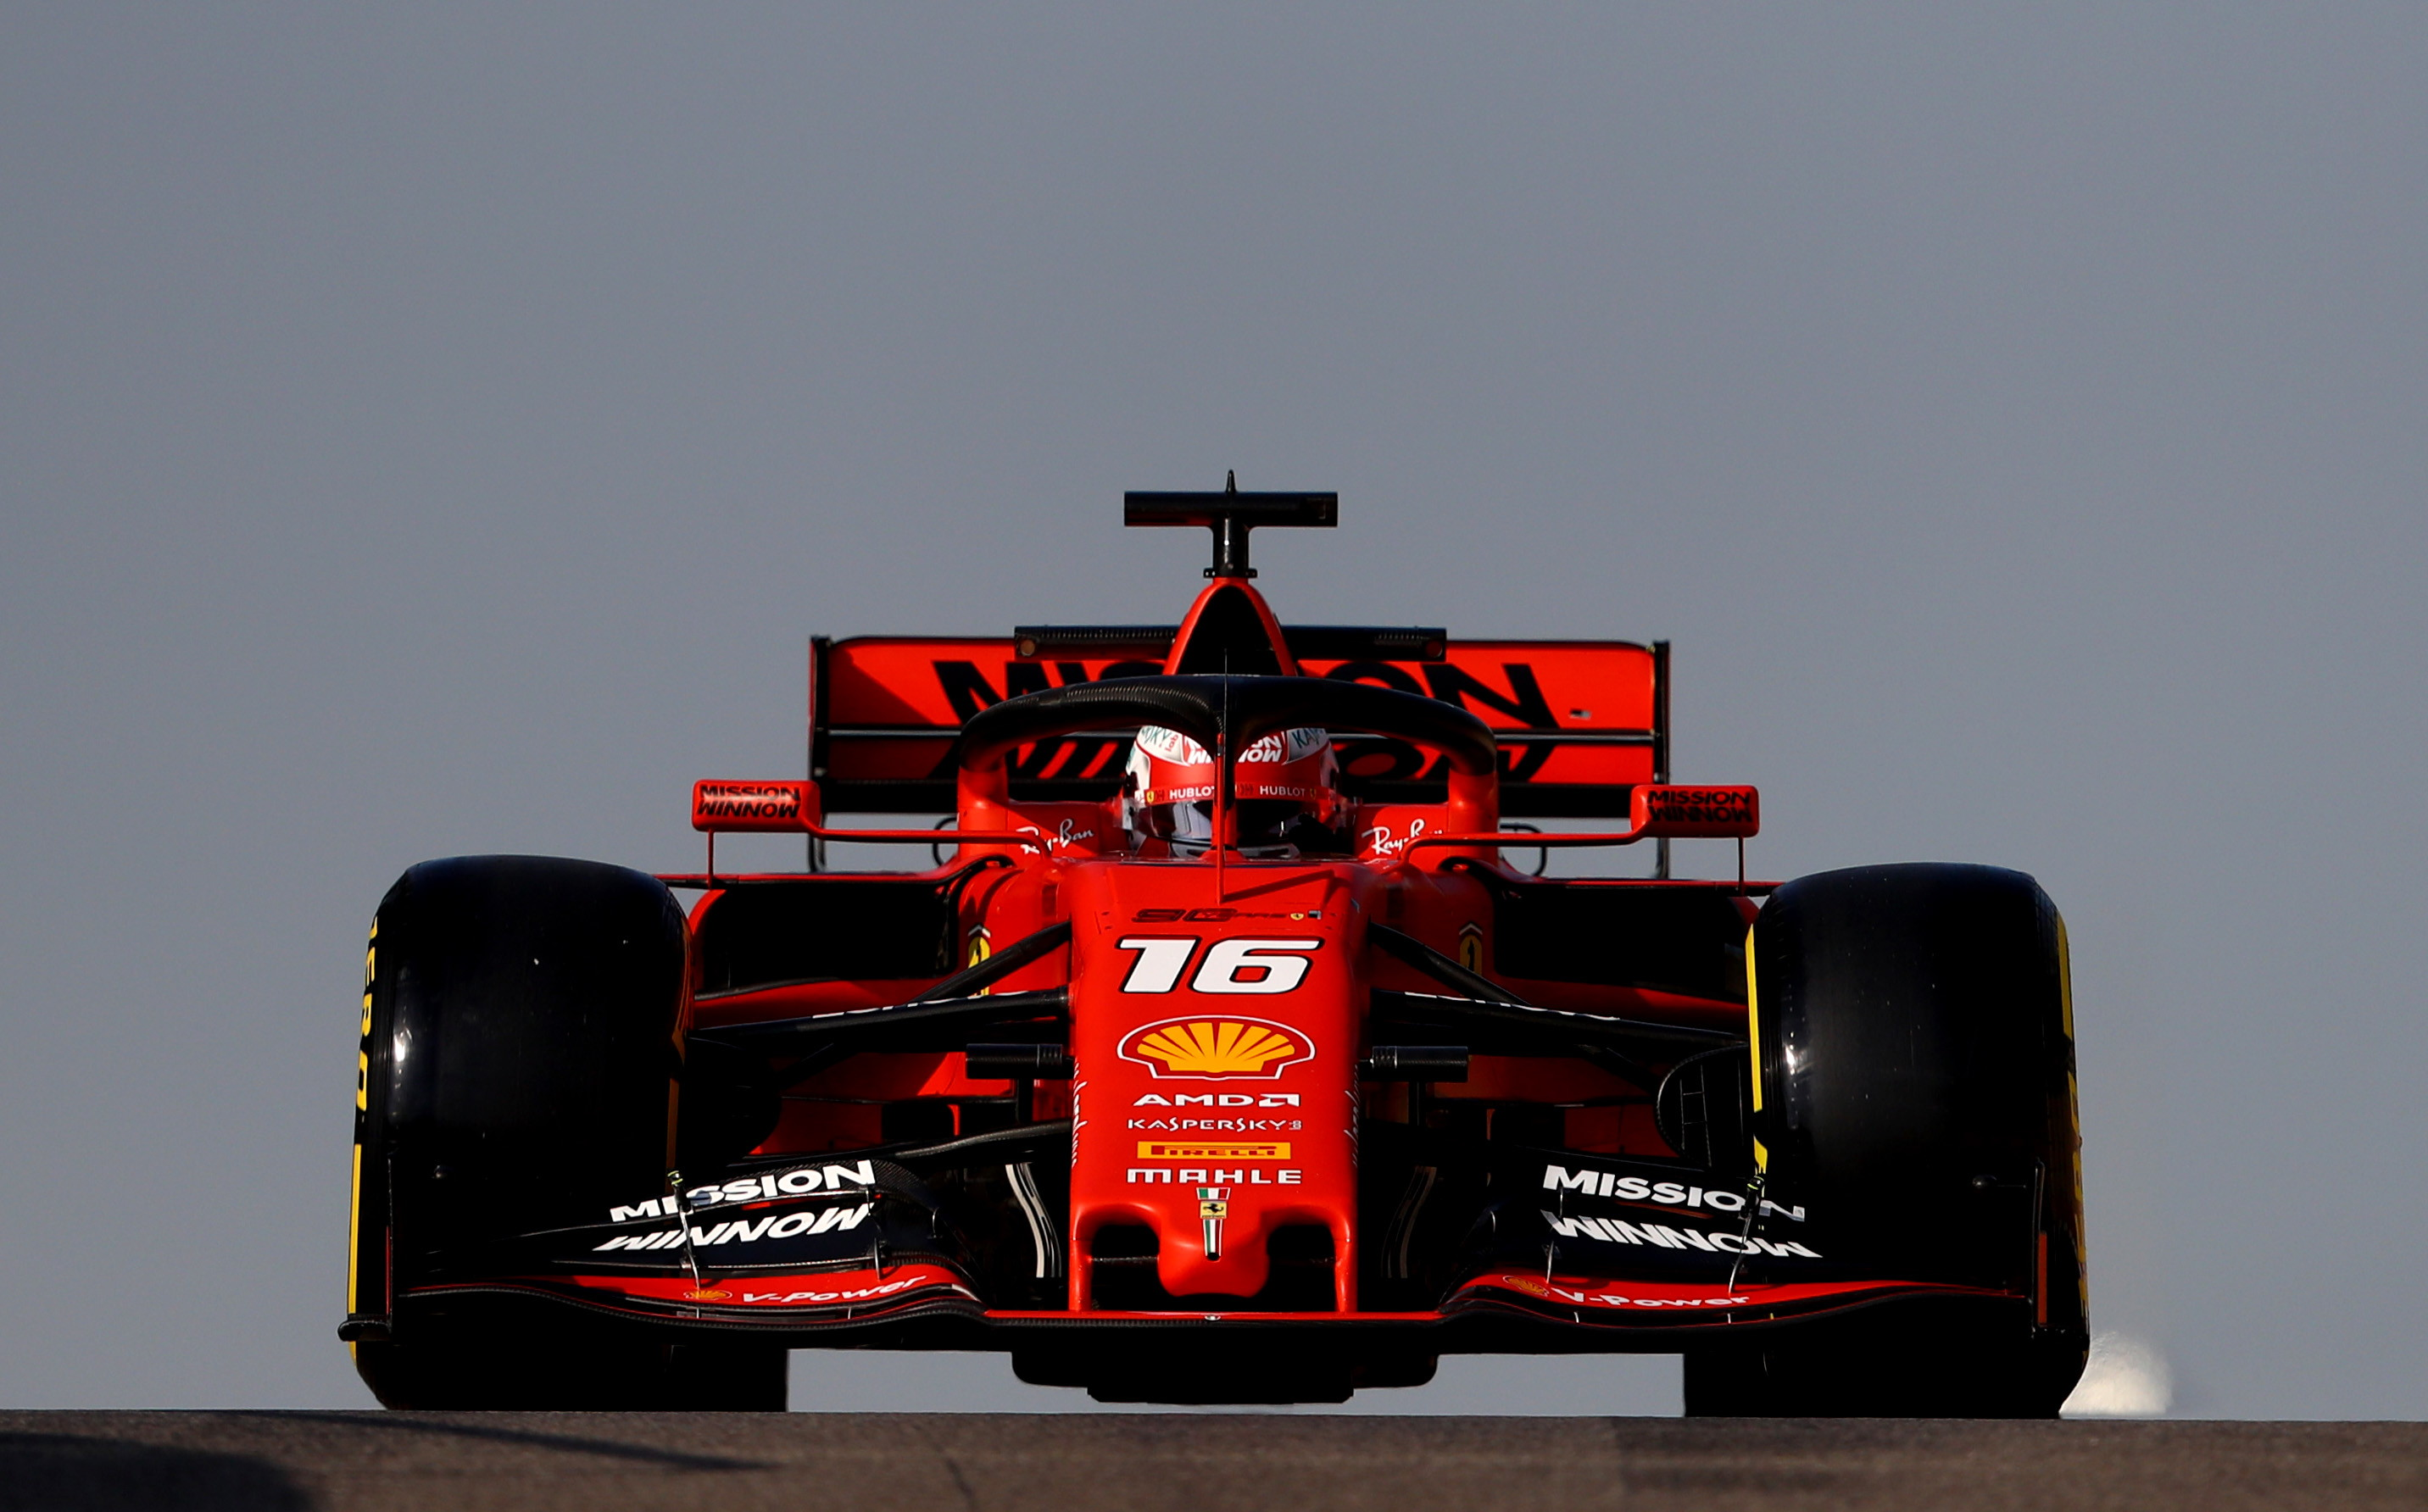 1) Ferrari (1.350 milioni di dollari di valore; 426 milioni di dollari di ricavo)